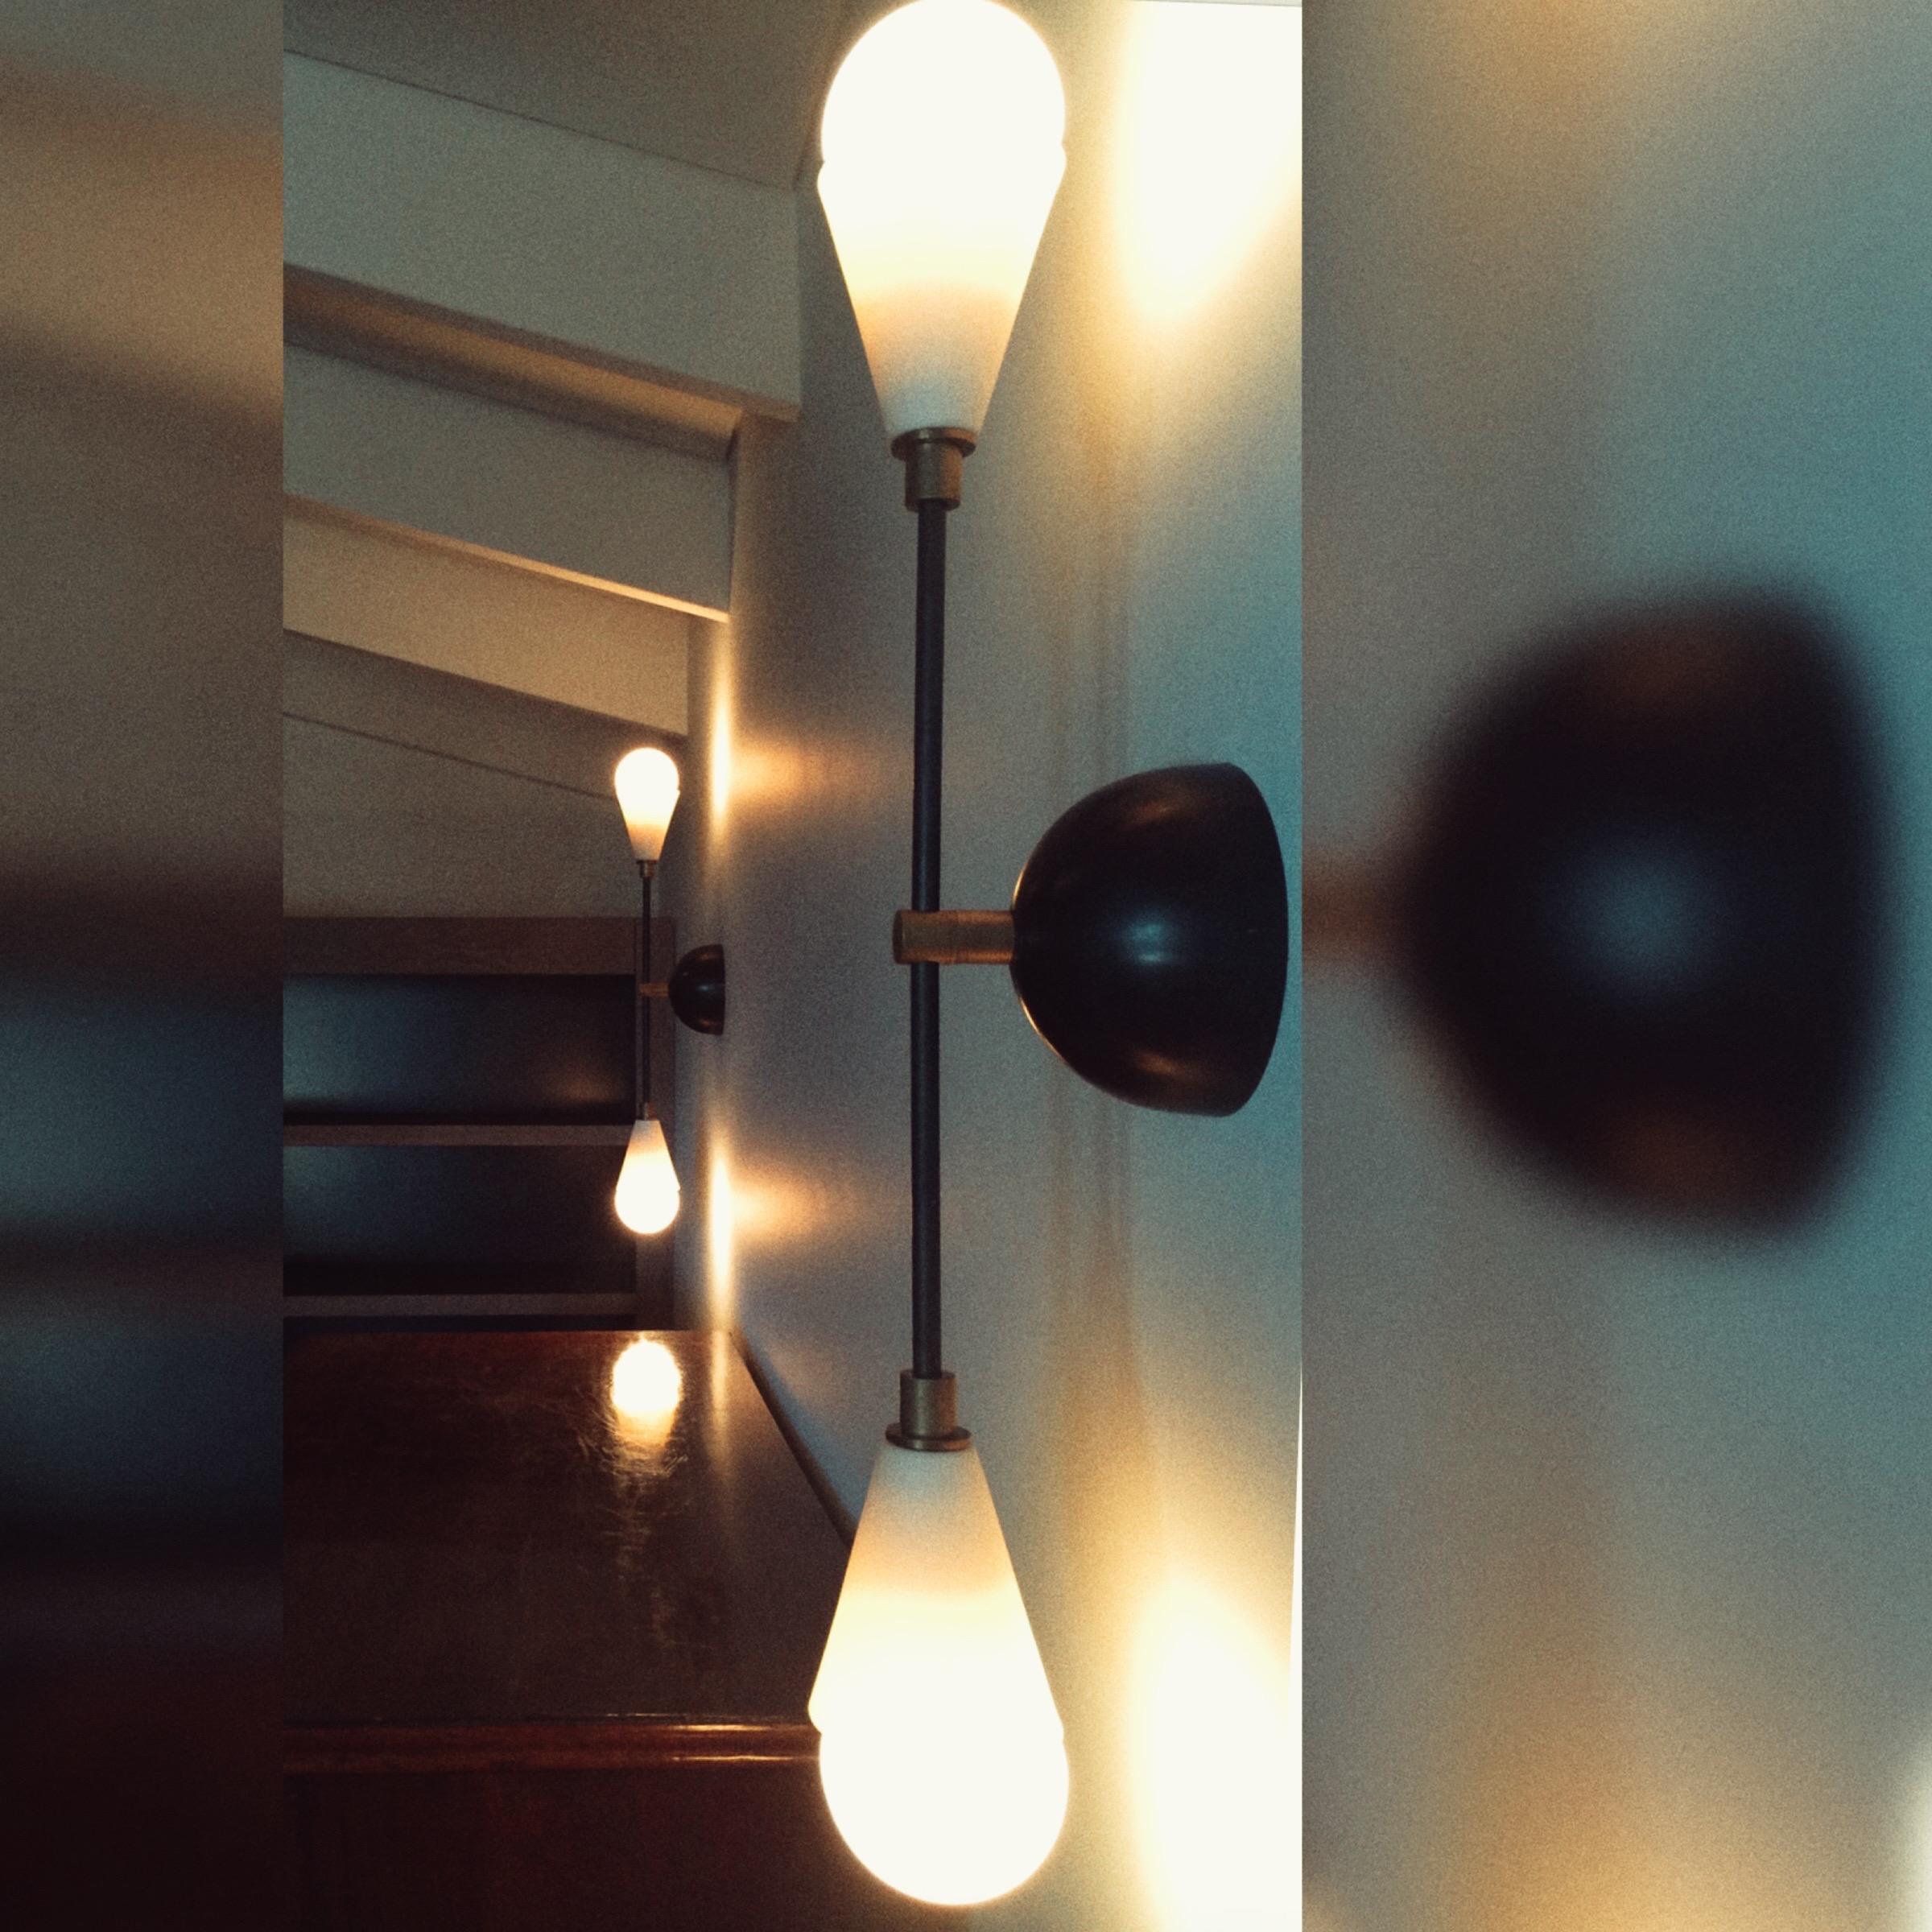 Dressing room with Apparatus NY wall lights